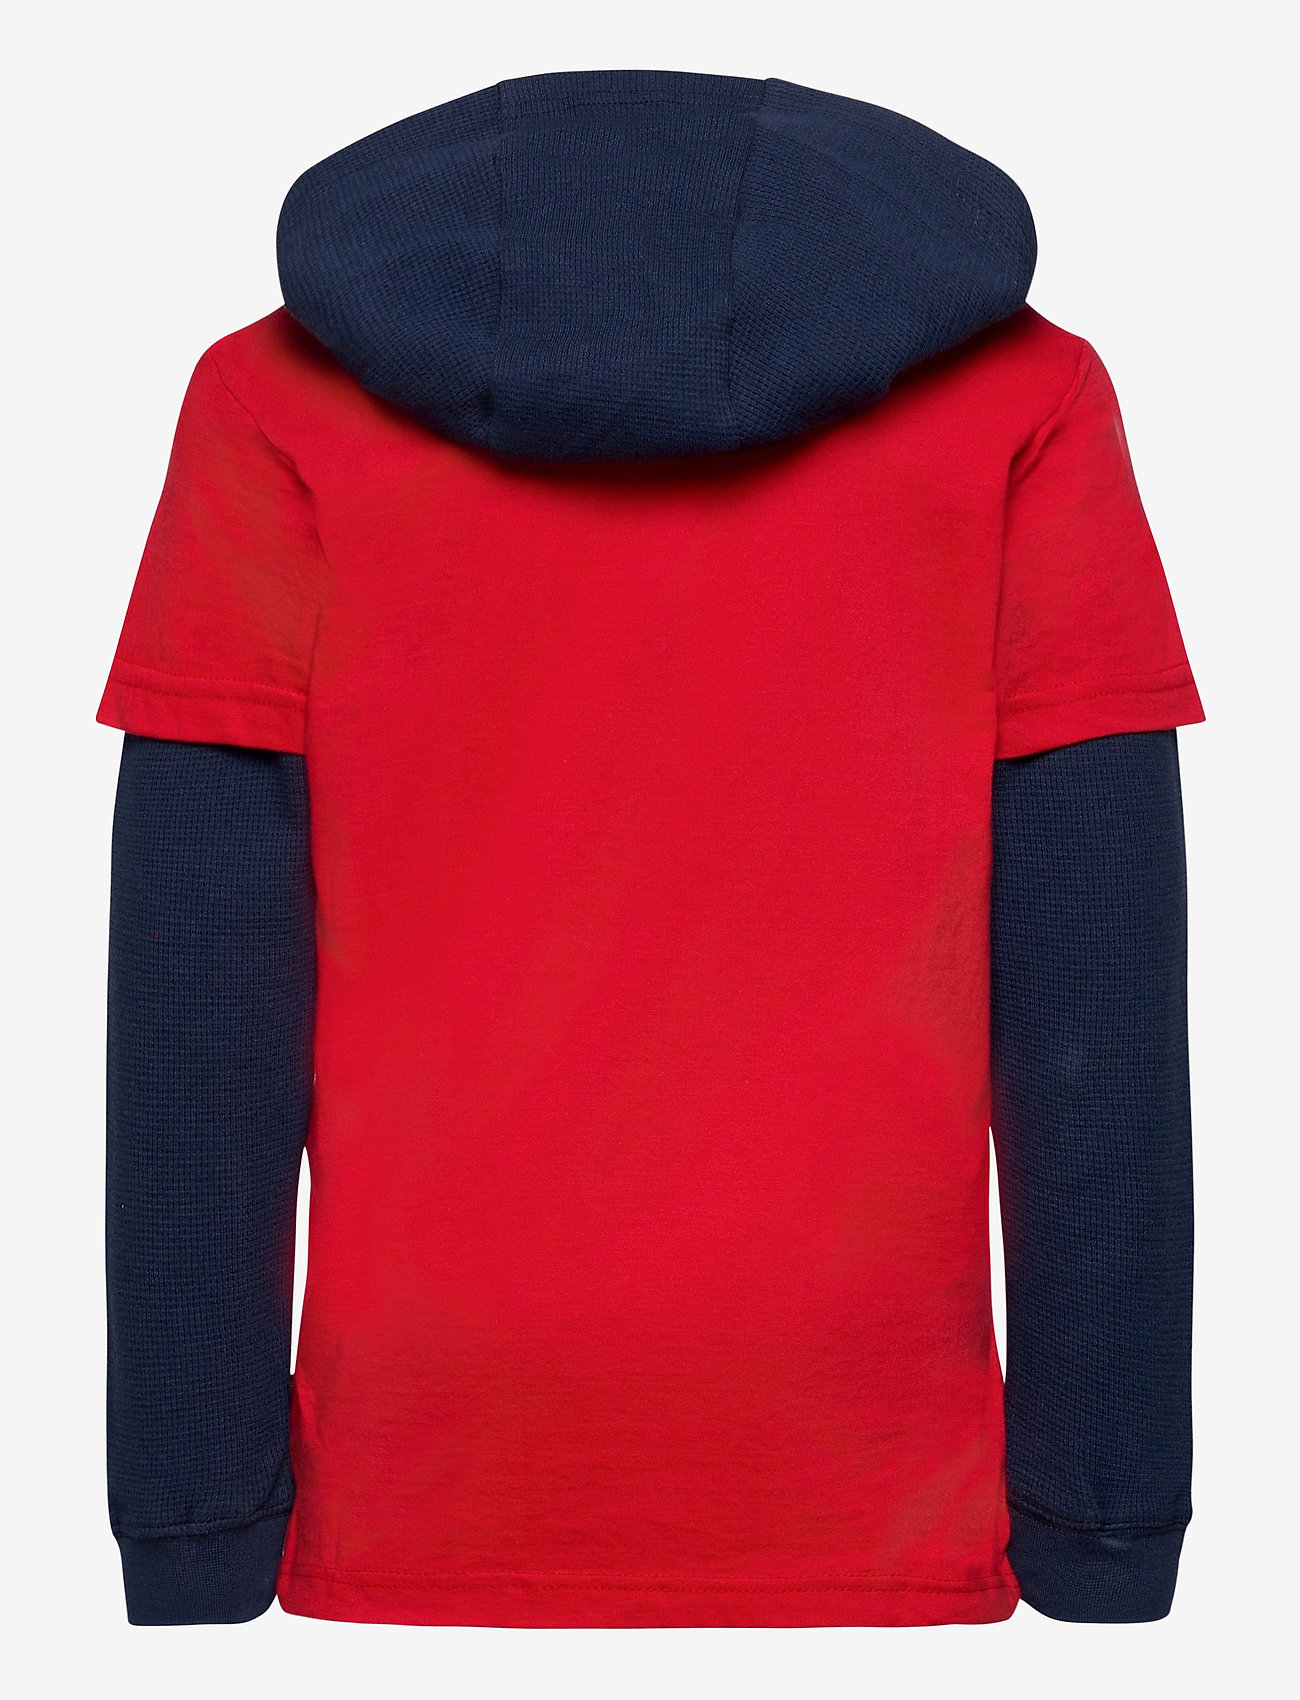 Levi's - LVB2FERPULLOVERHOODIE - hoodies - super red - 1